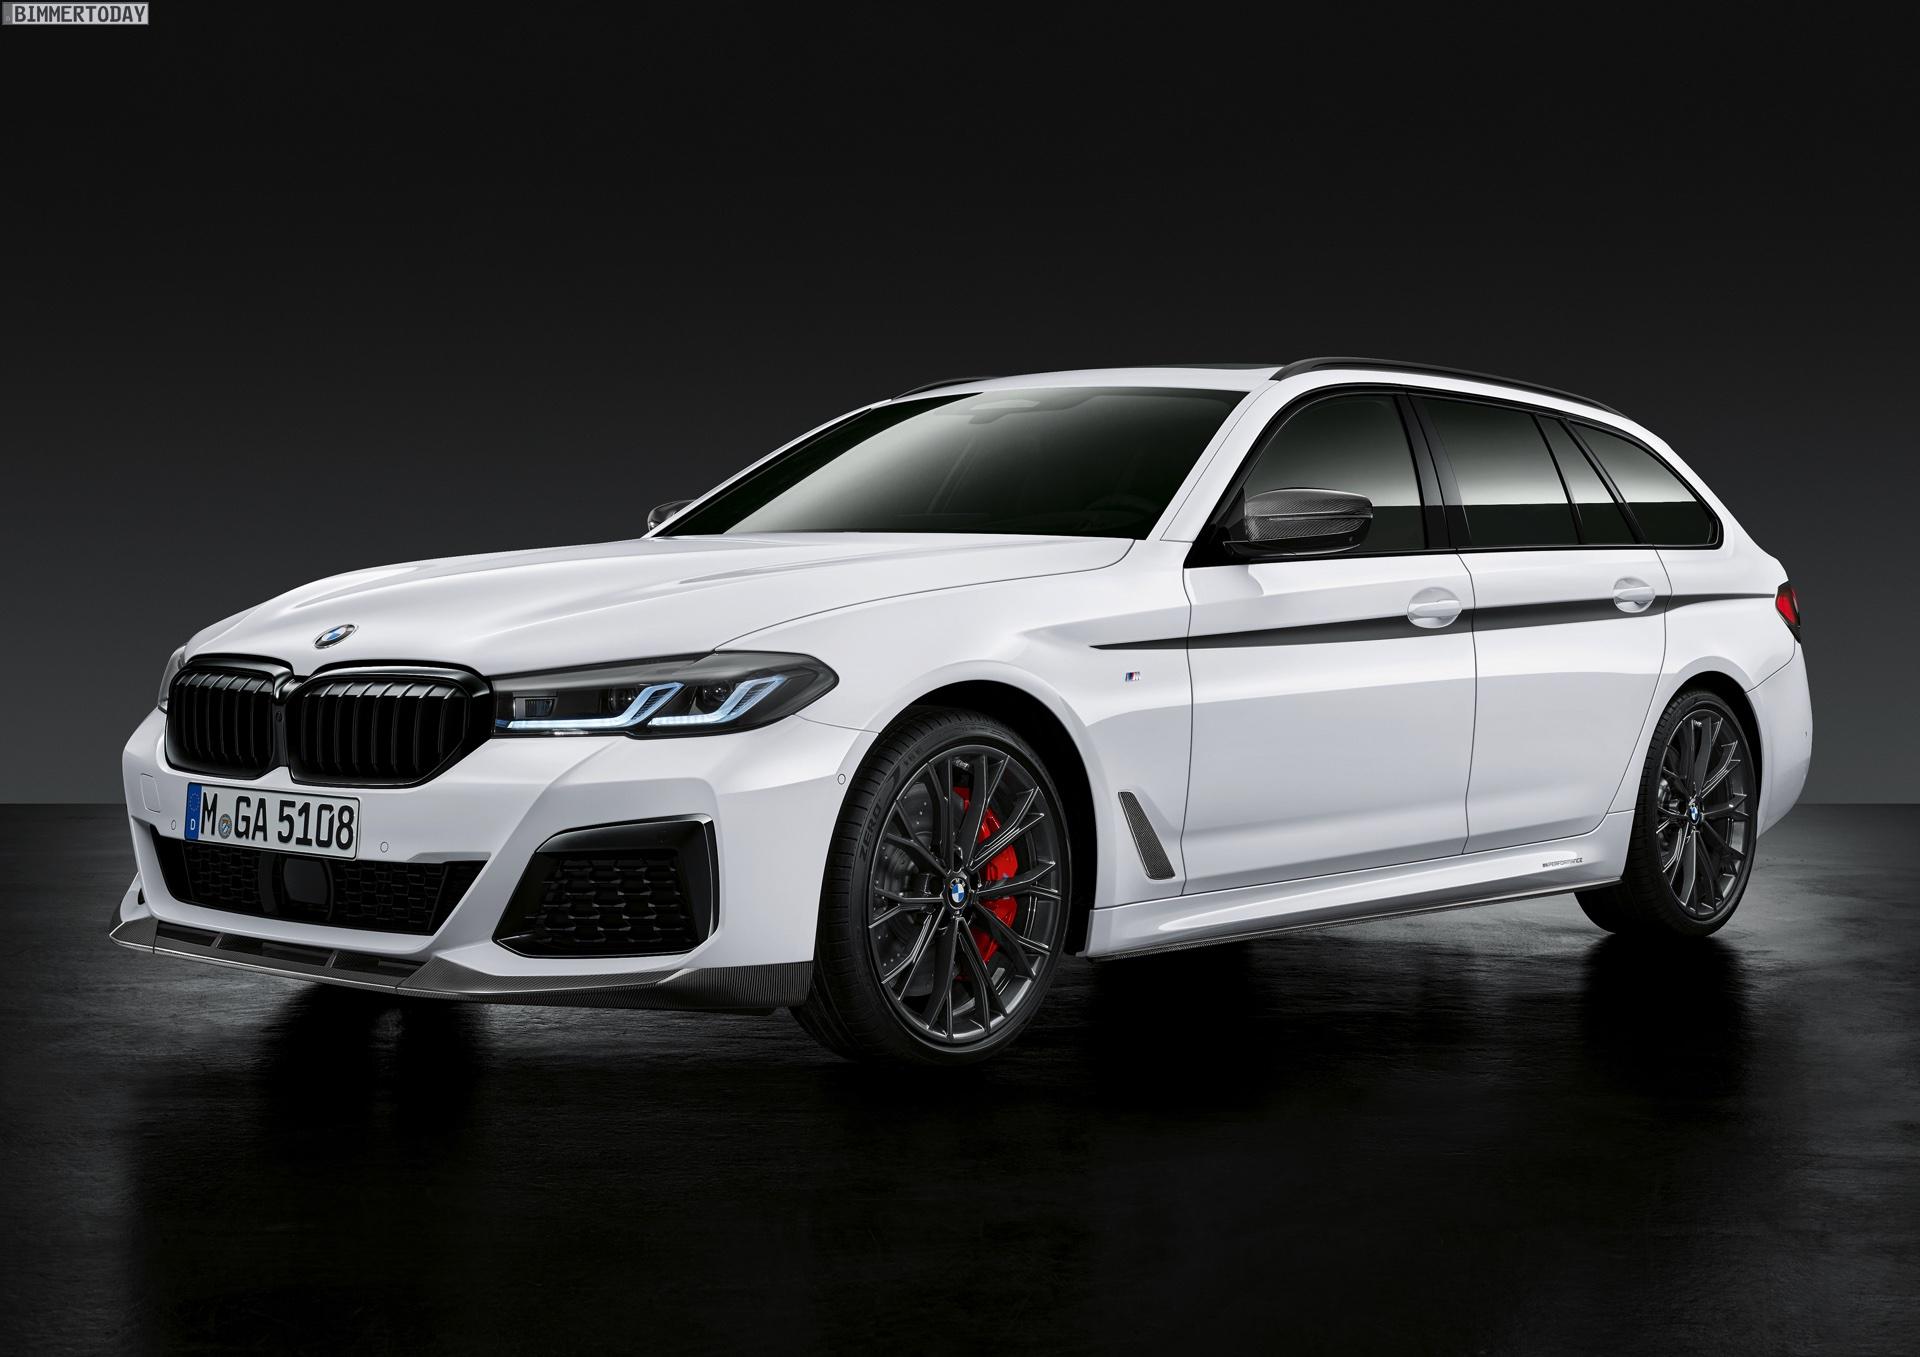 BMW 5er Facelift 2020: Erste Fotos mit M Performance-Tuning